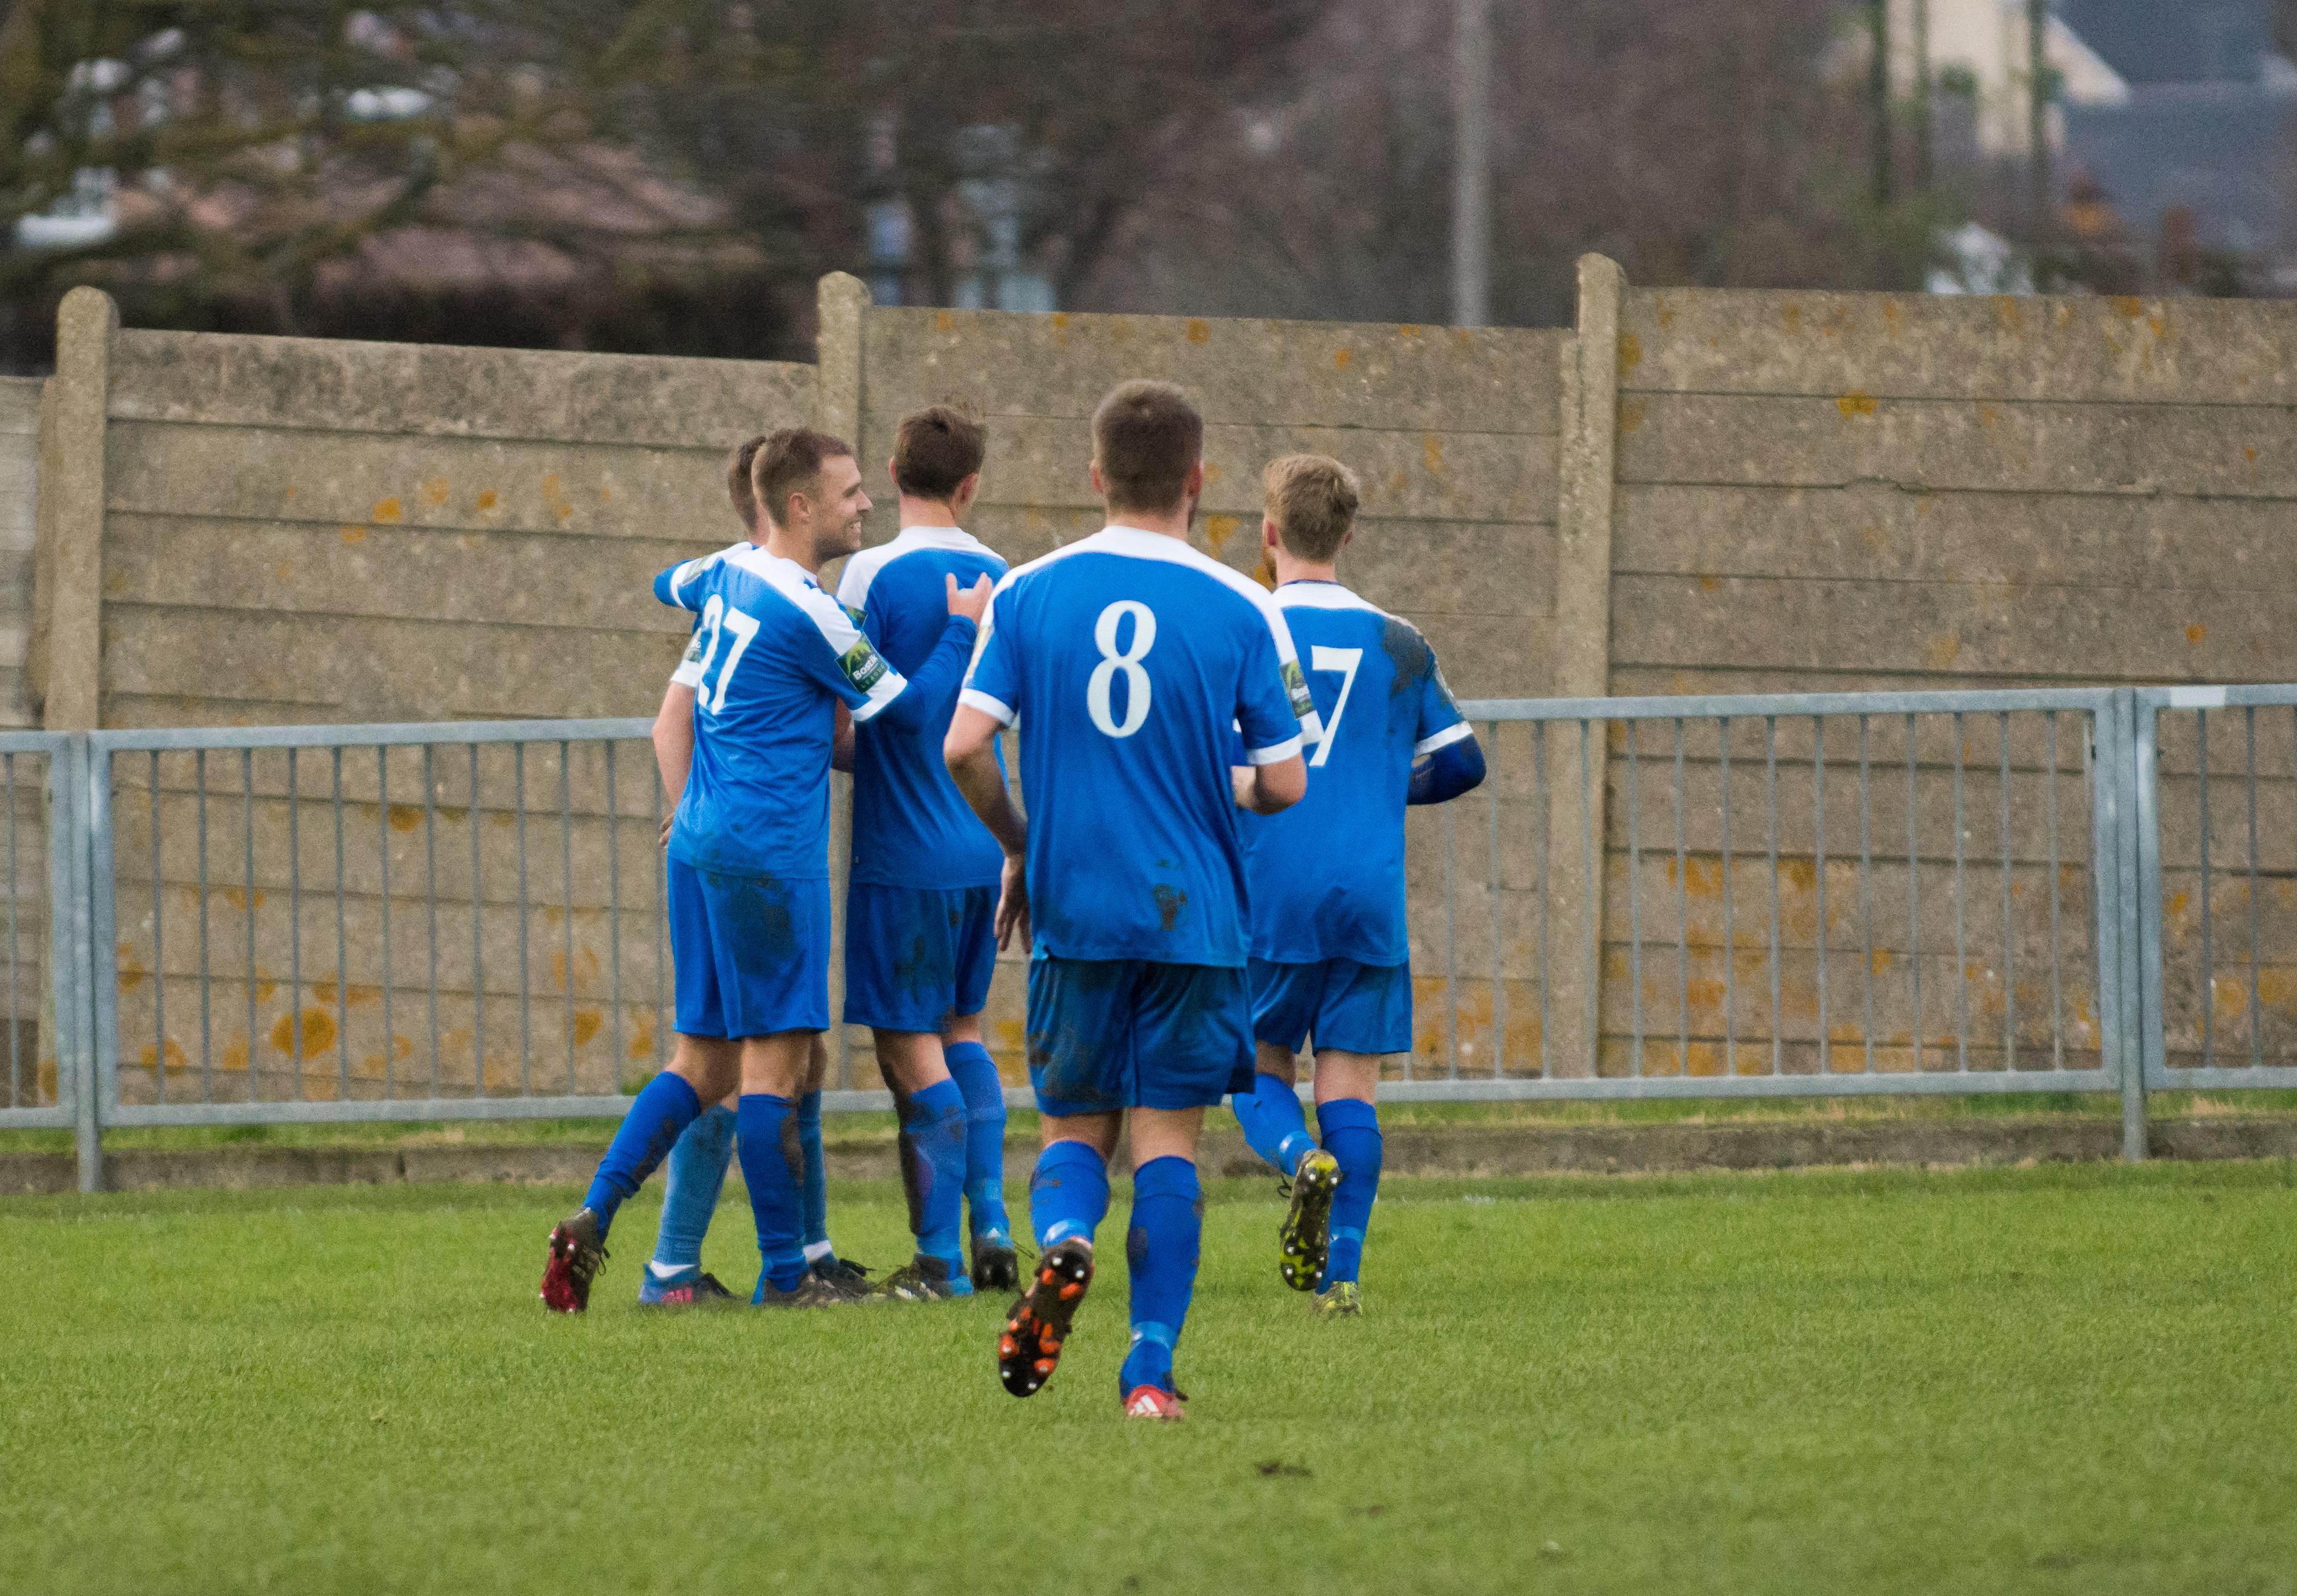 Shoreham FC vs Faversham Town 16.12.17 48